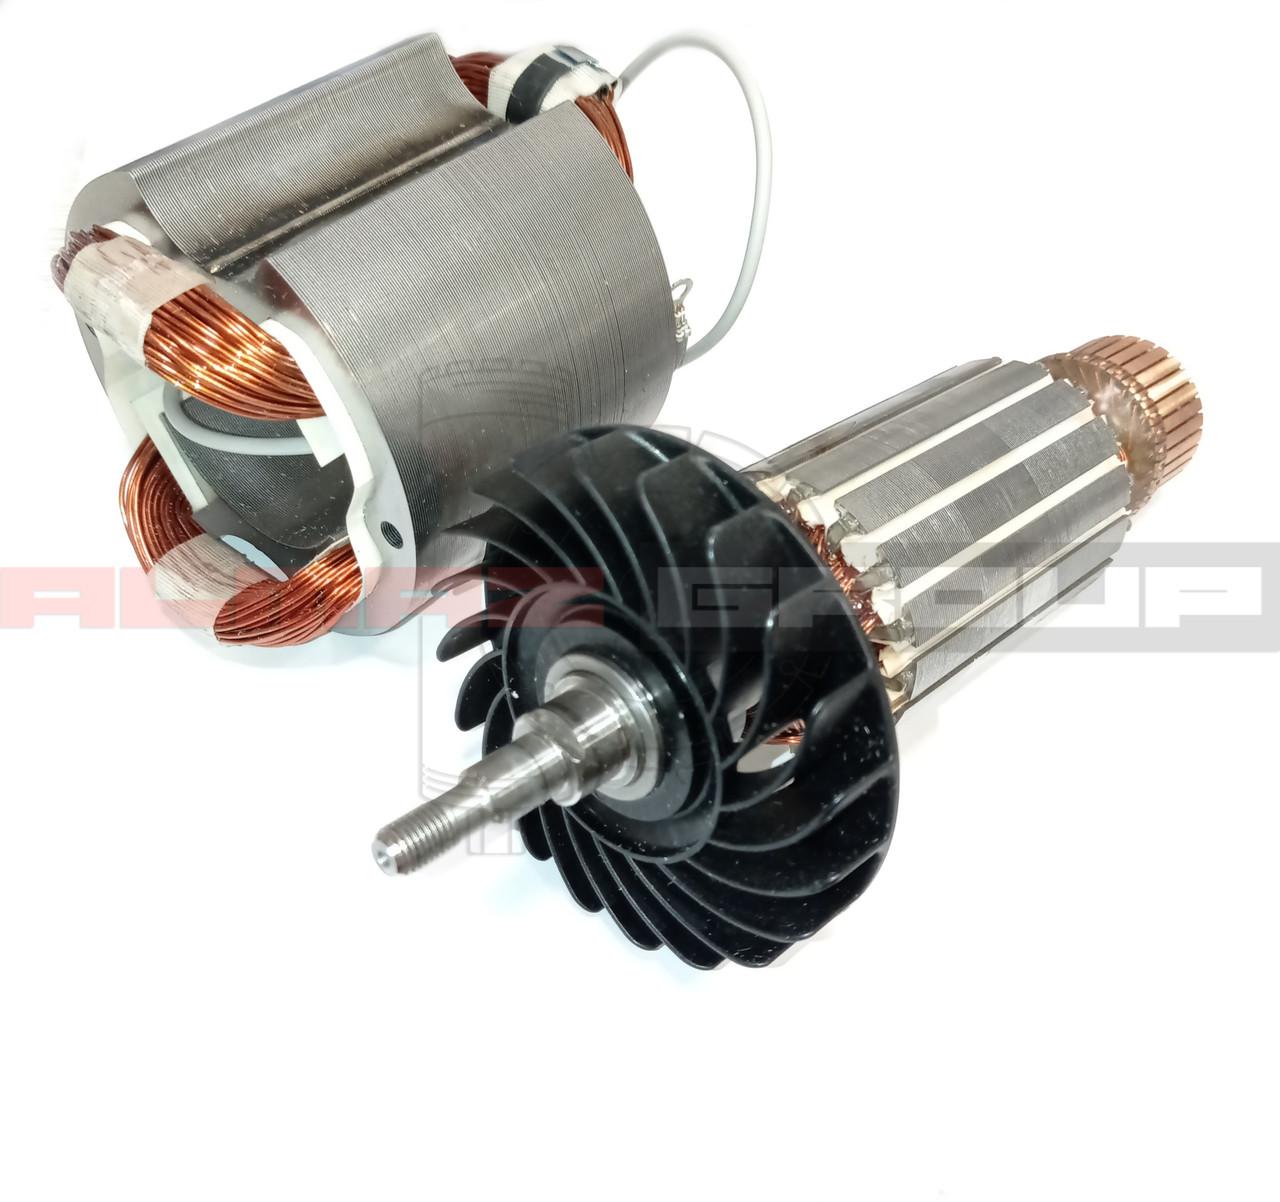 Электродвигатель K 3000, K 4000, CnB 230V Husqvarna